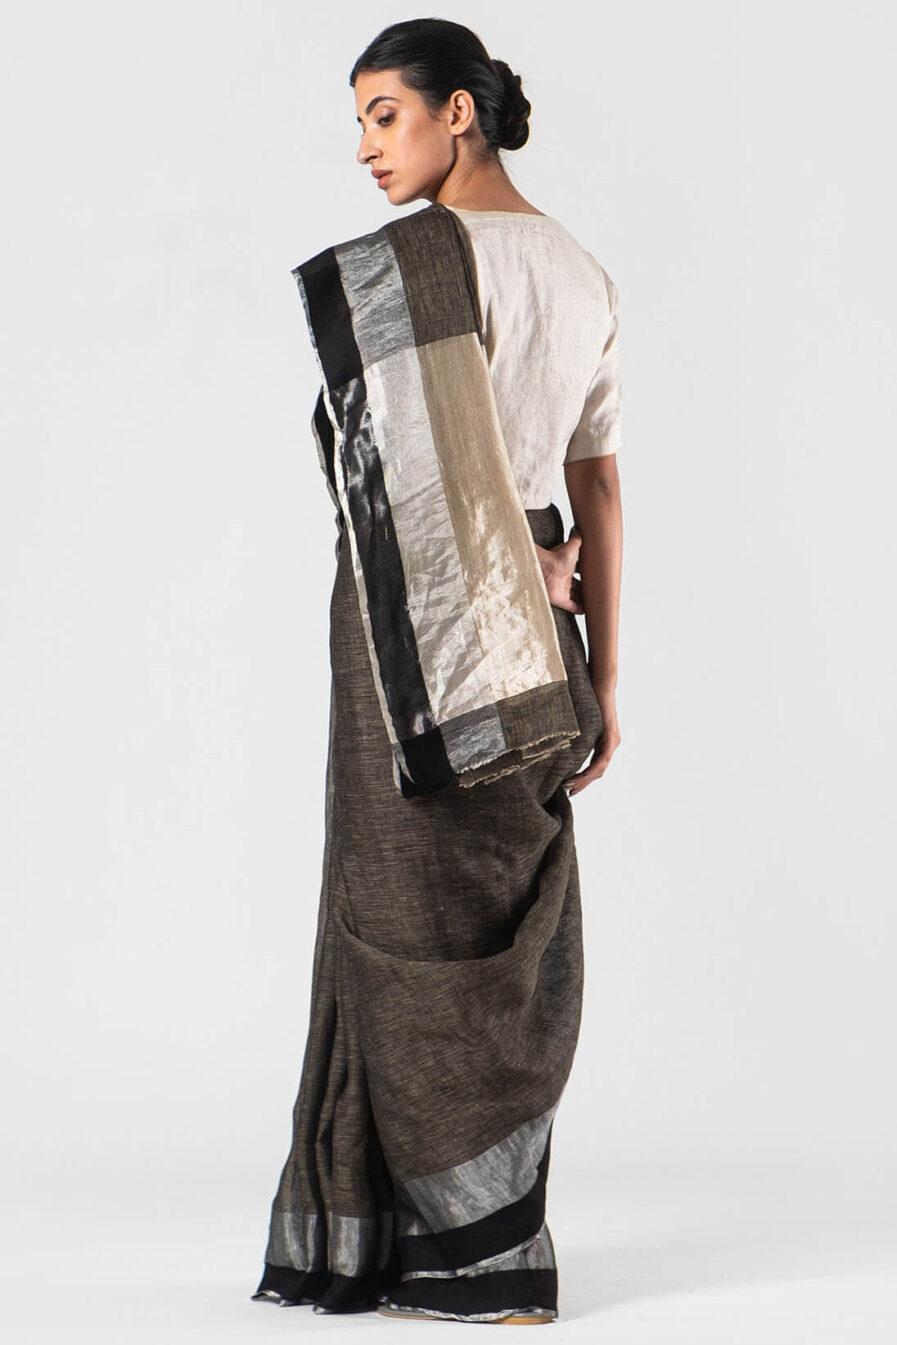 Anavila Charcoal Black satin border sari